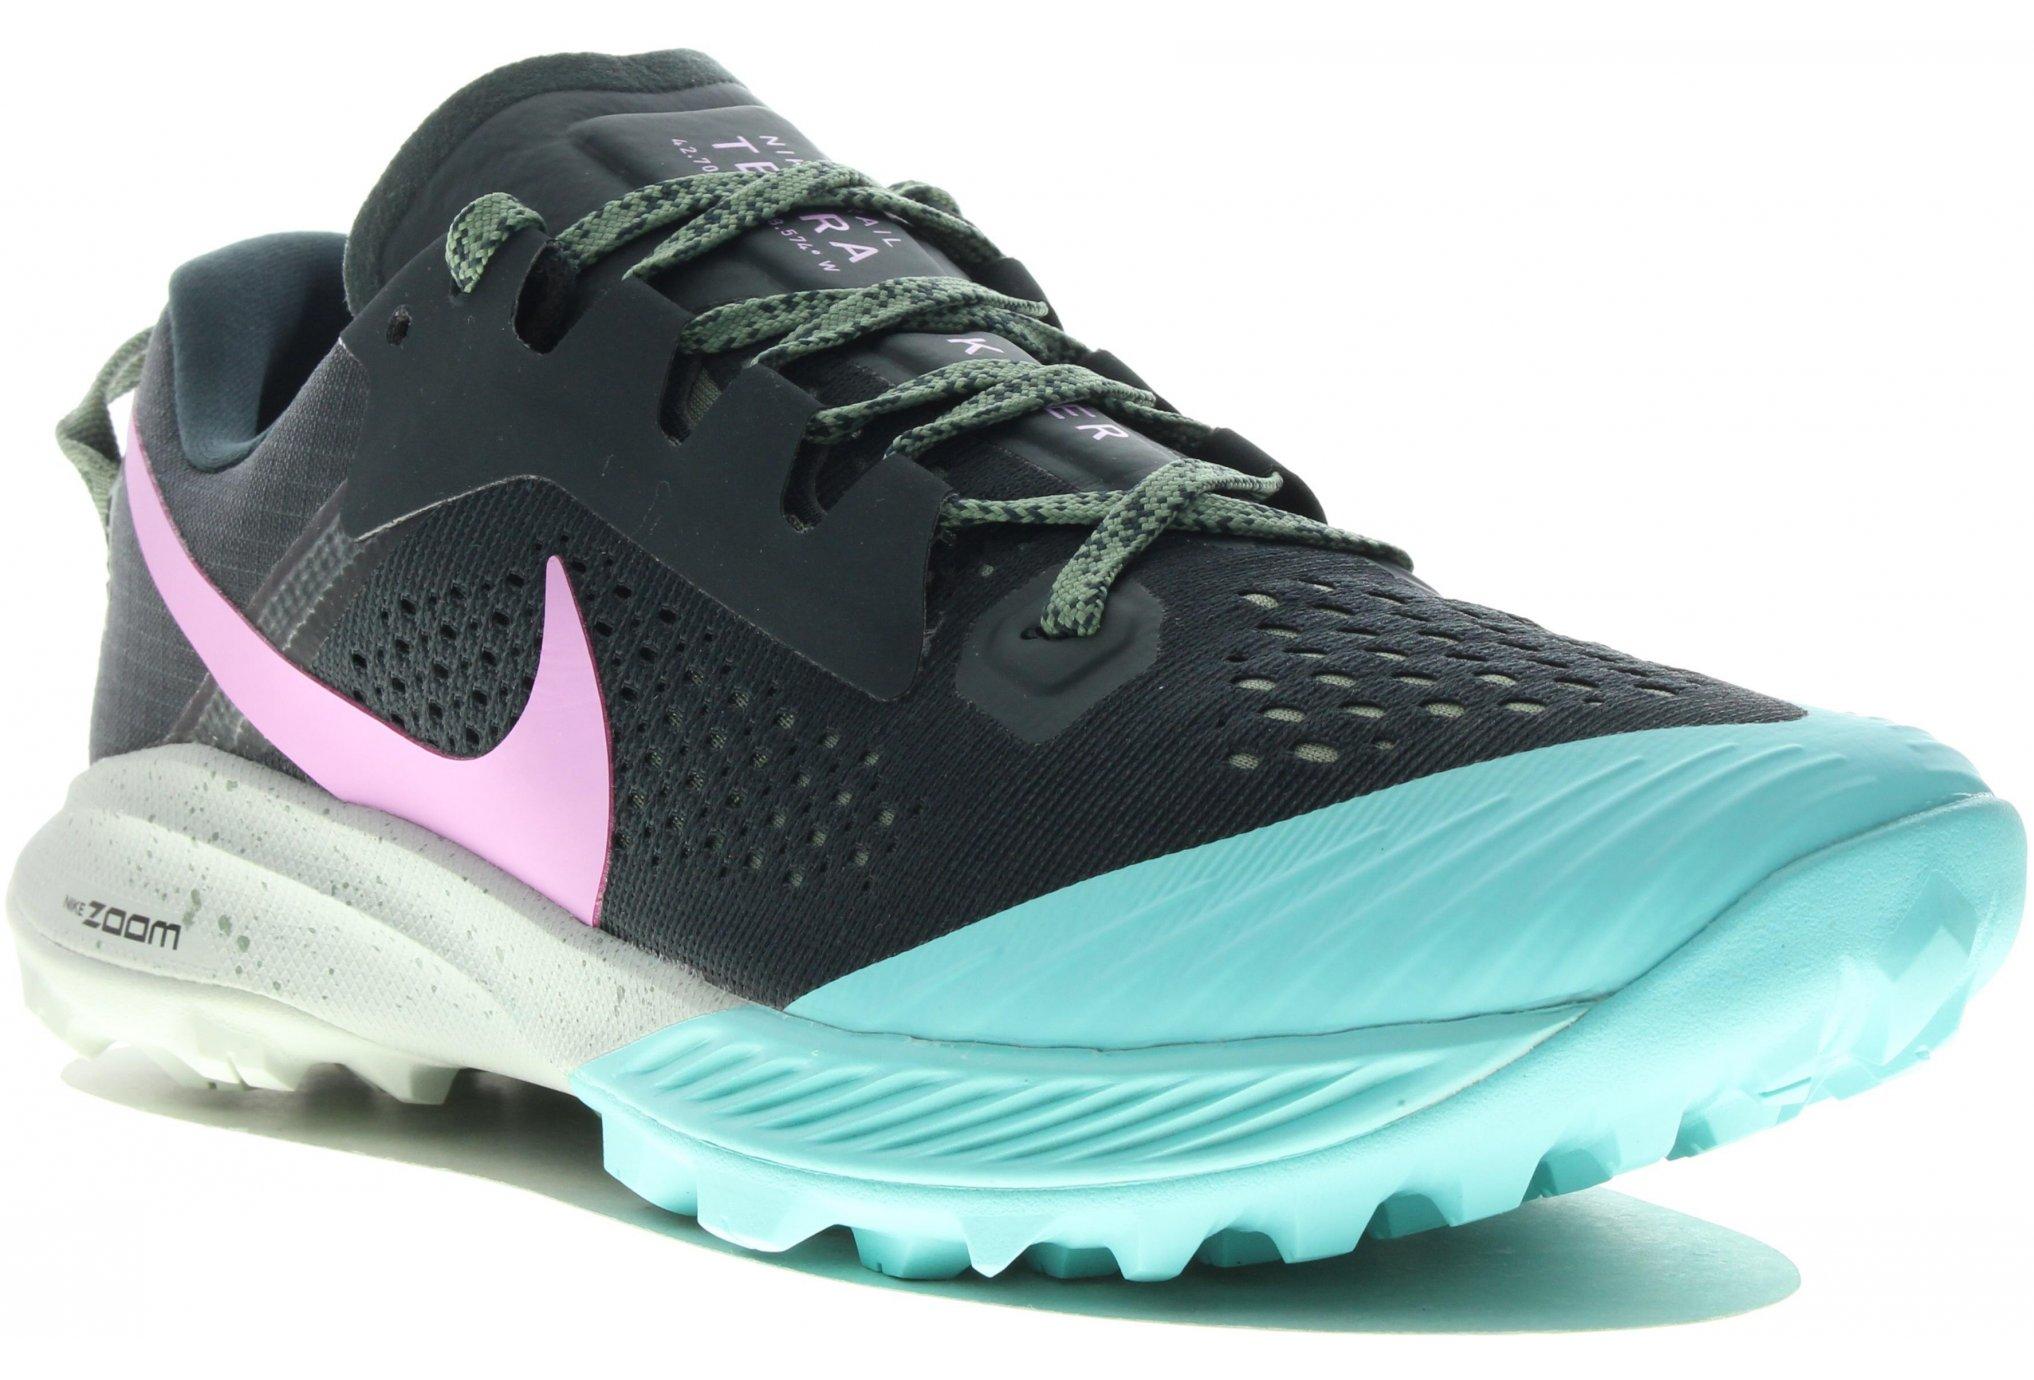 Nike Air Zoom Terra Kiger 6 W Diététique Chaussures femme